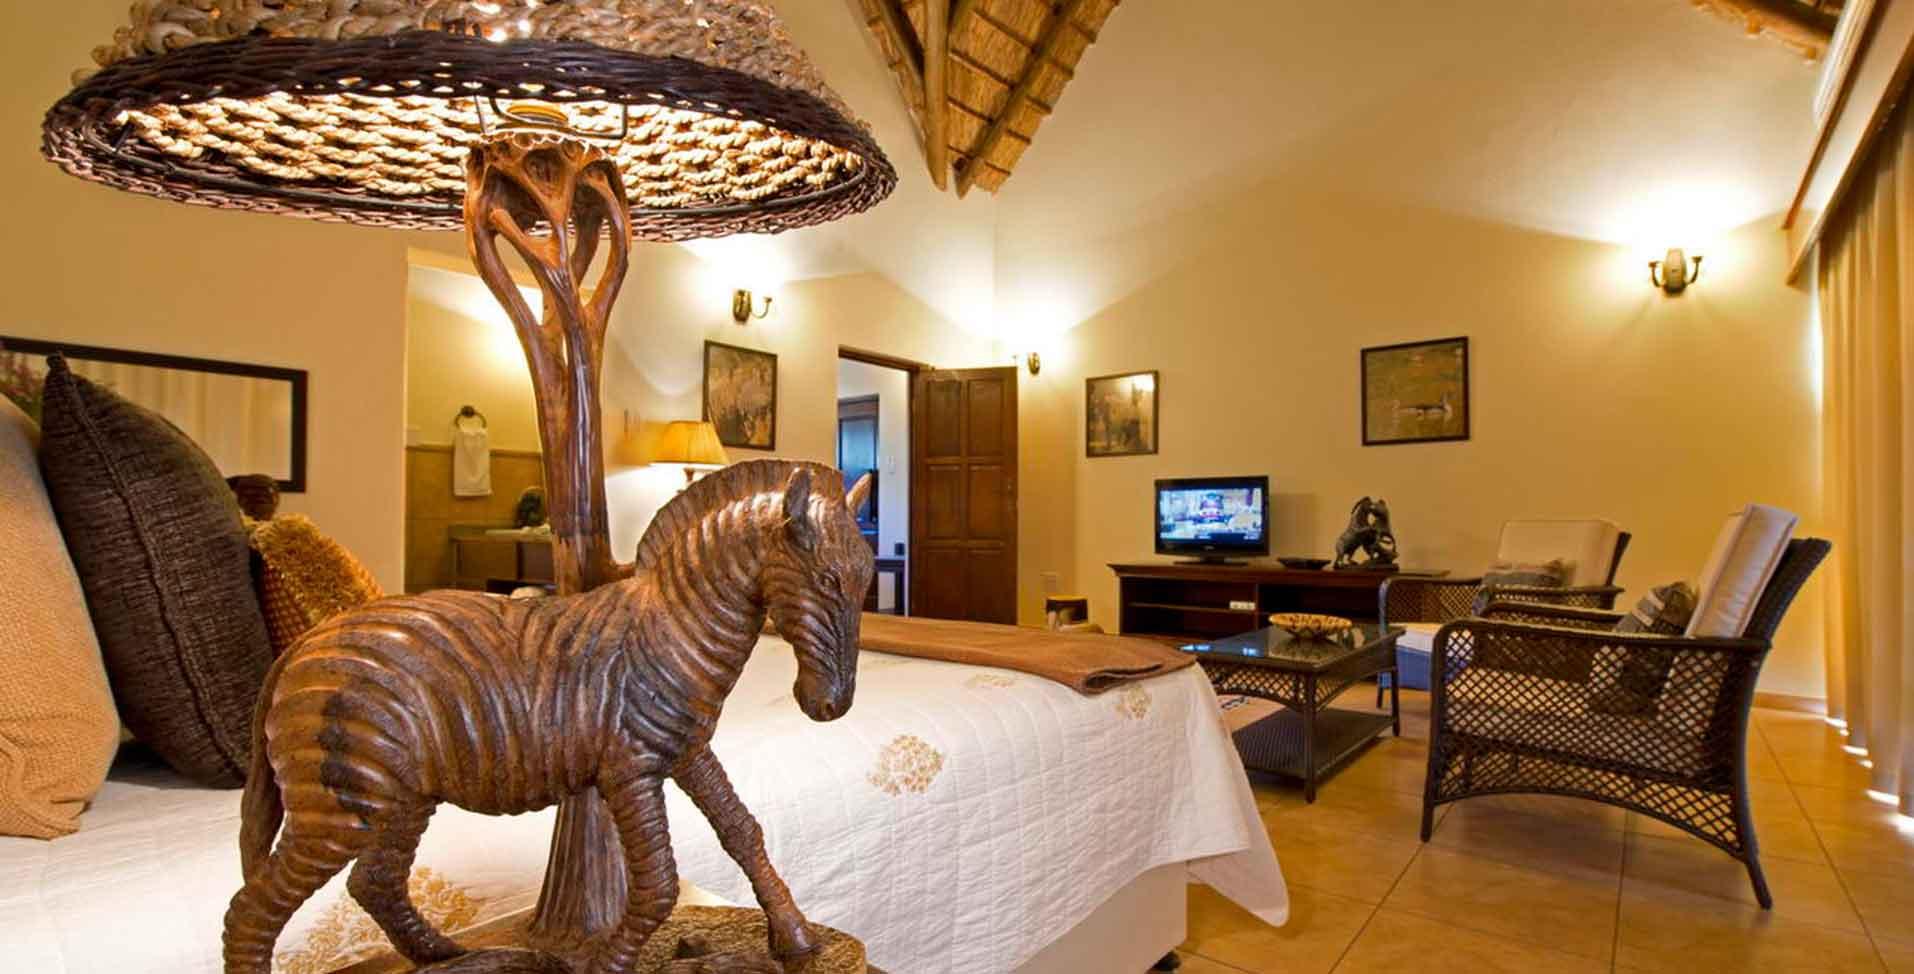 Luxury suites decor 01 thaba khaya lodge - Luxury home furnishings and decor collection ...